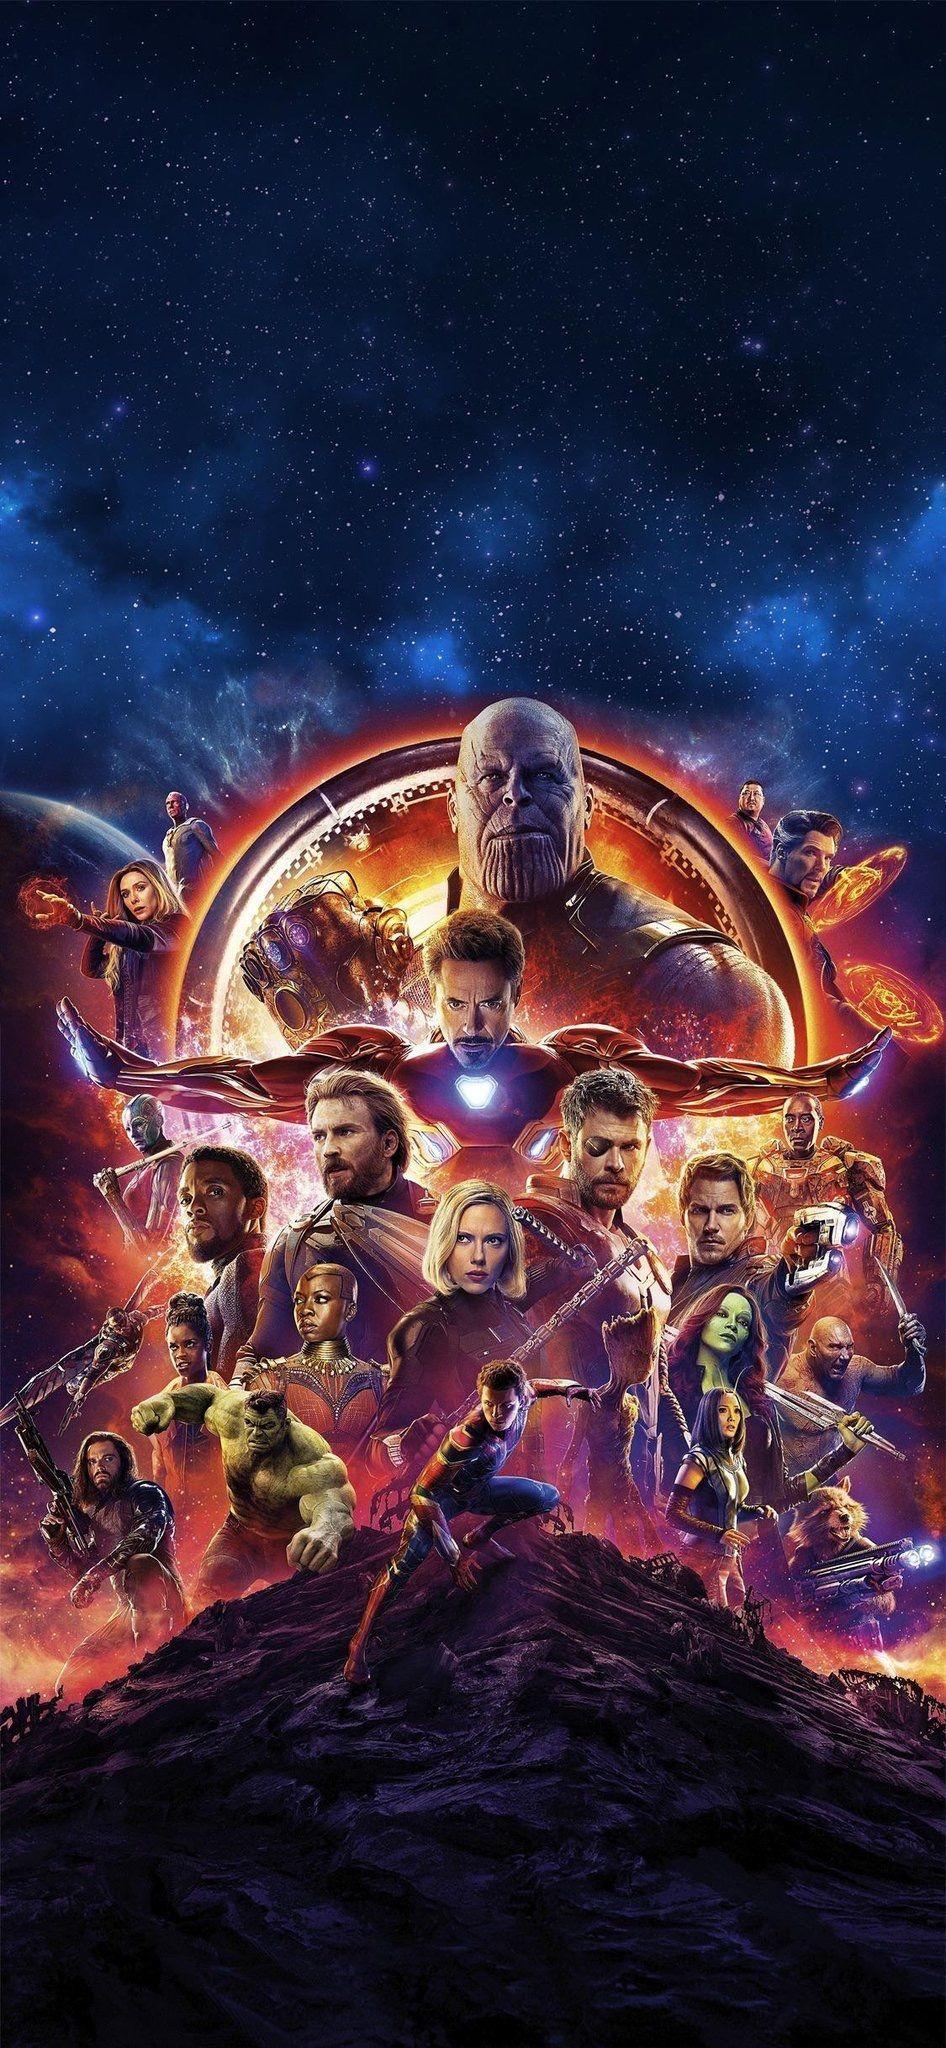 Avenger Endgame Wallpaper Iphone A7465638d96b9466e35968092e1785ad Iphonexwallpaper Avengers Wallpaper Marvel Wallpaper Marvel Drawings